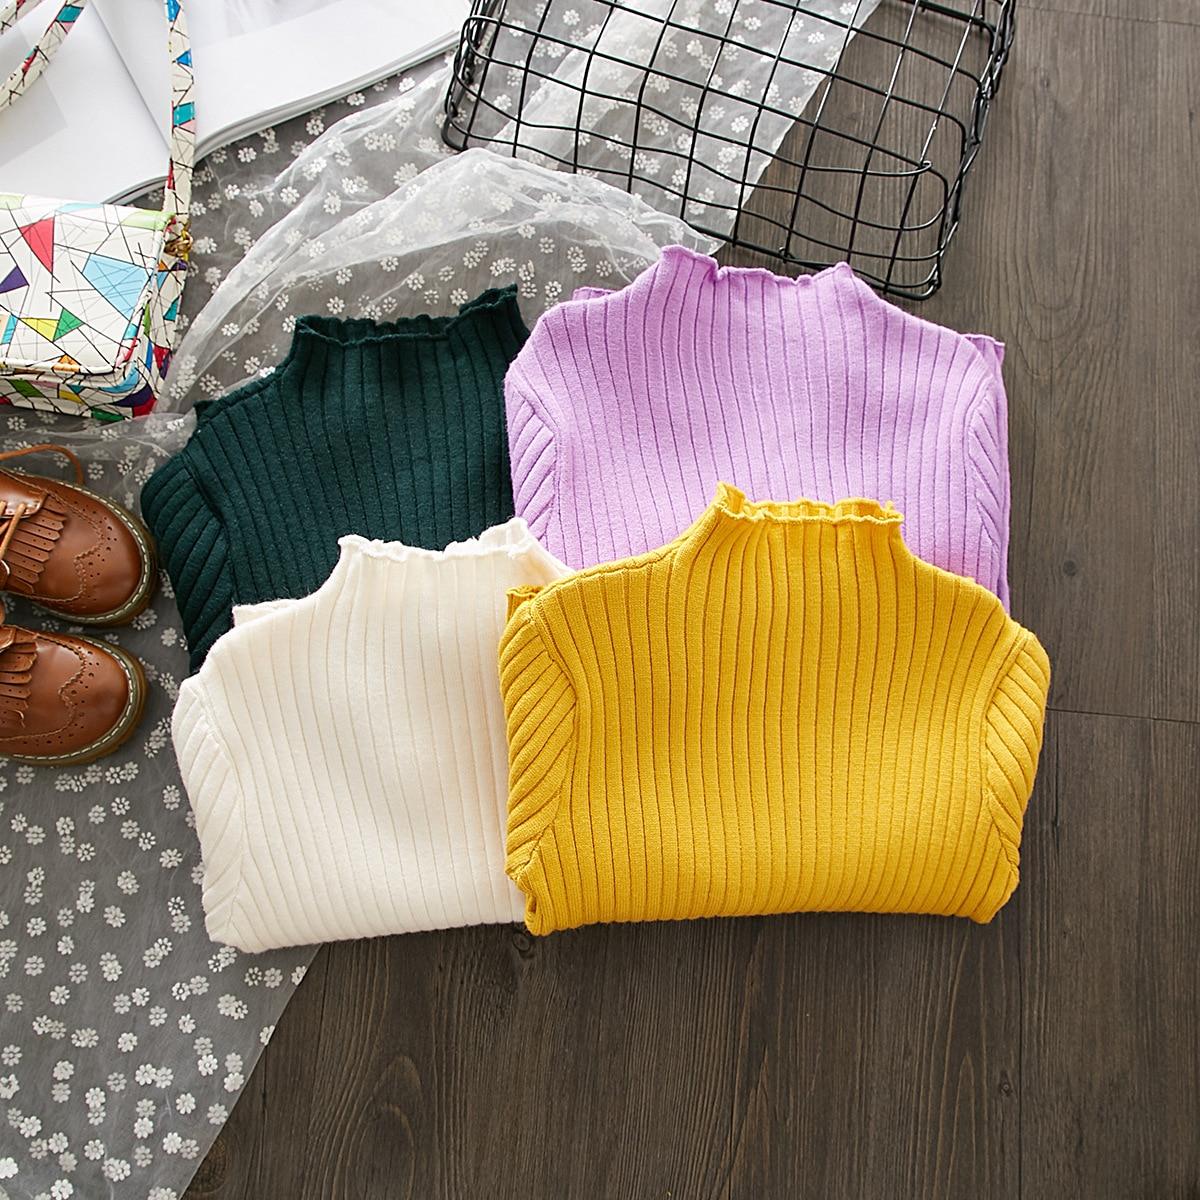 Autumn And Winter Korean-style Summer Girls Fashion Goods Cute Knit Low Waist Jersey CHILDREN'S Sweater